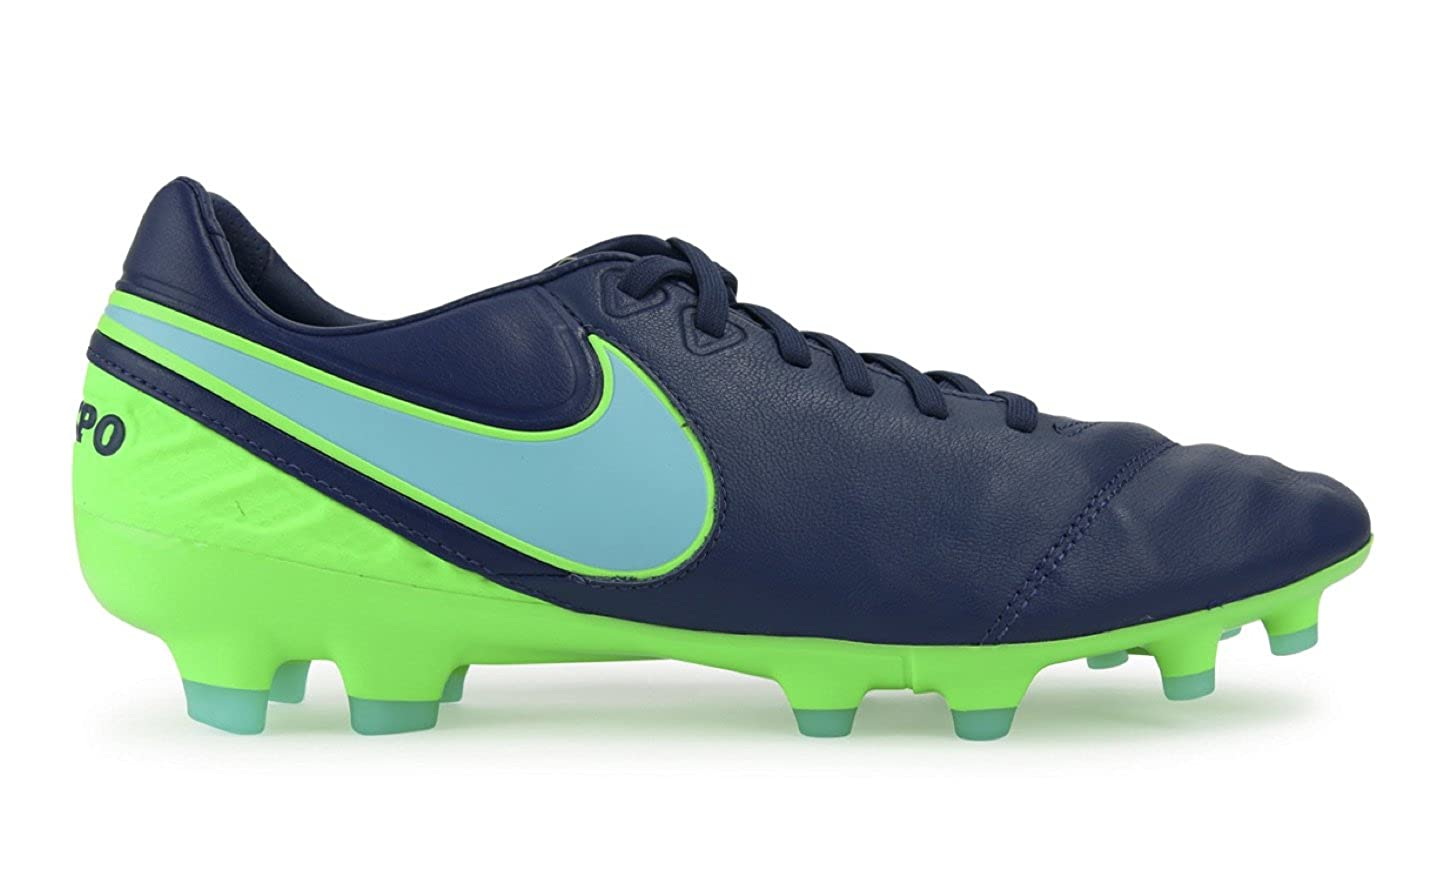 6ee4cd4ed2b76 Nike Tiempo Legend VI FG Men's Soccer Cleats